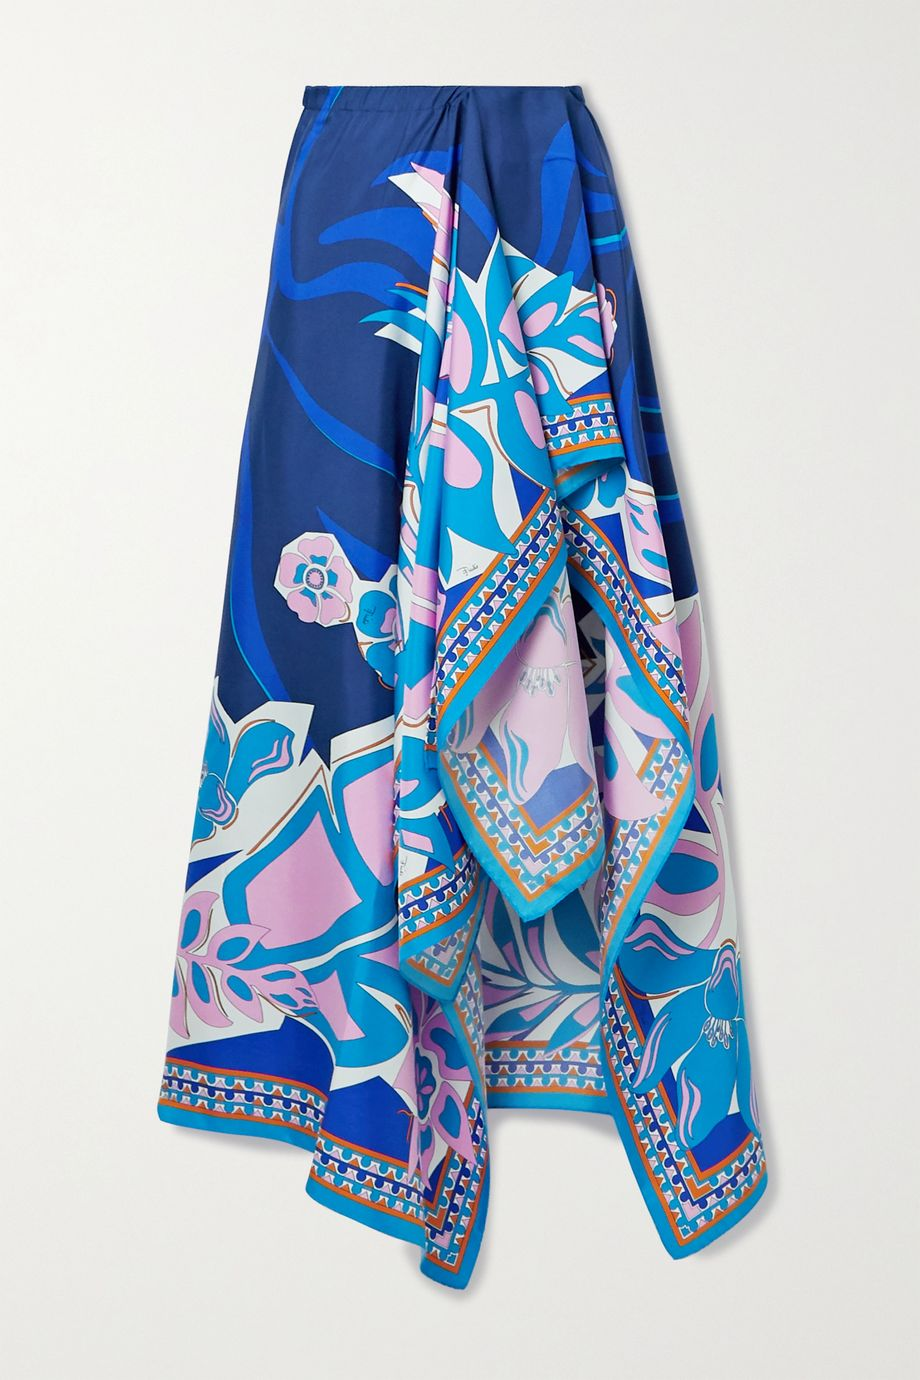 Emilio Pucci Samoa printed silk-satin pareo